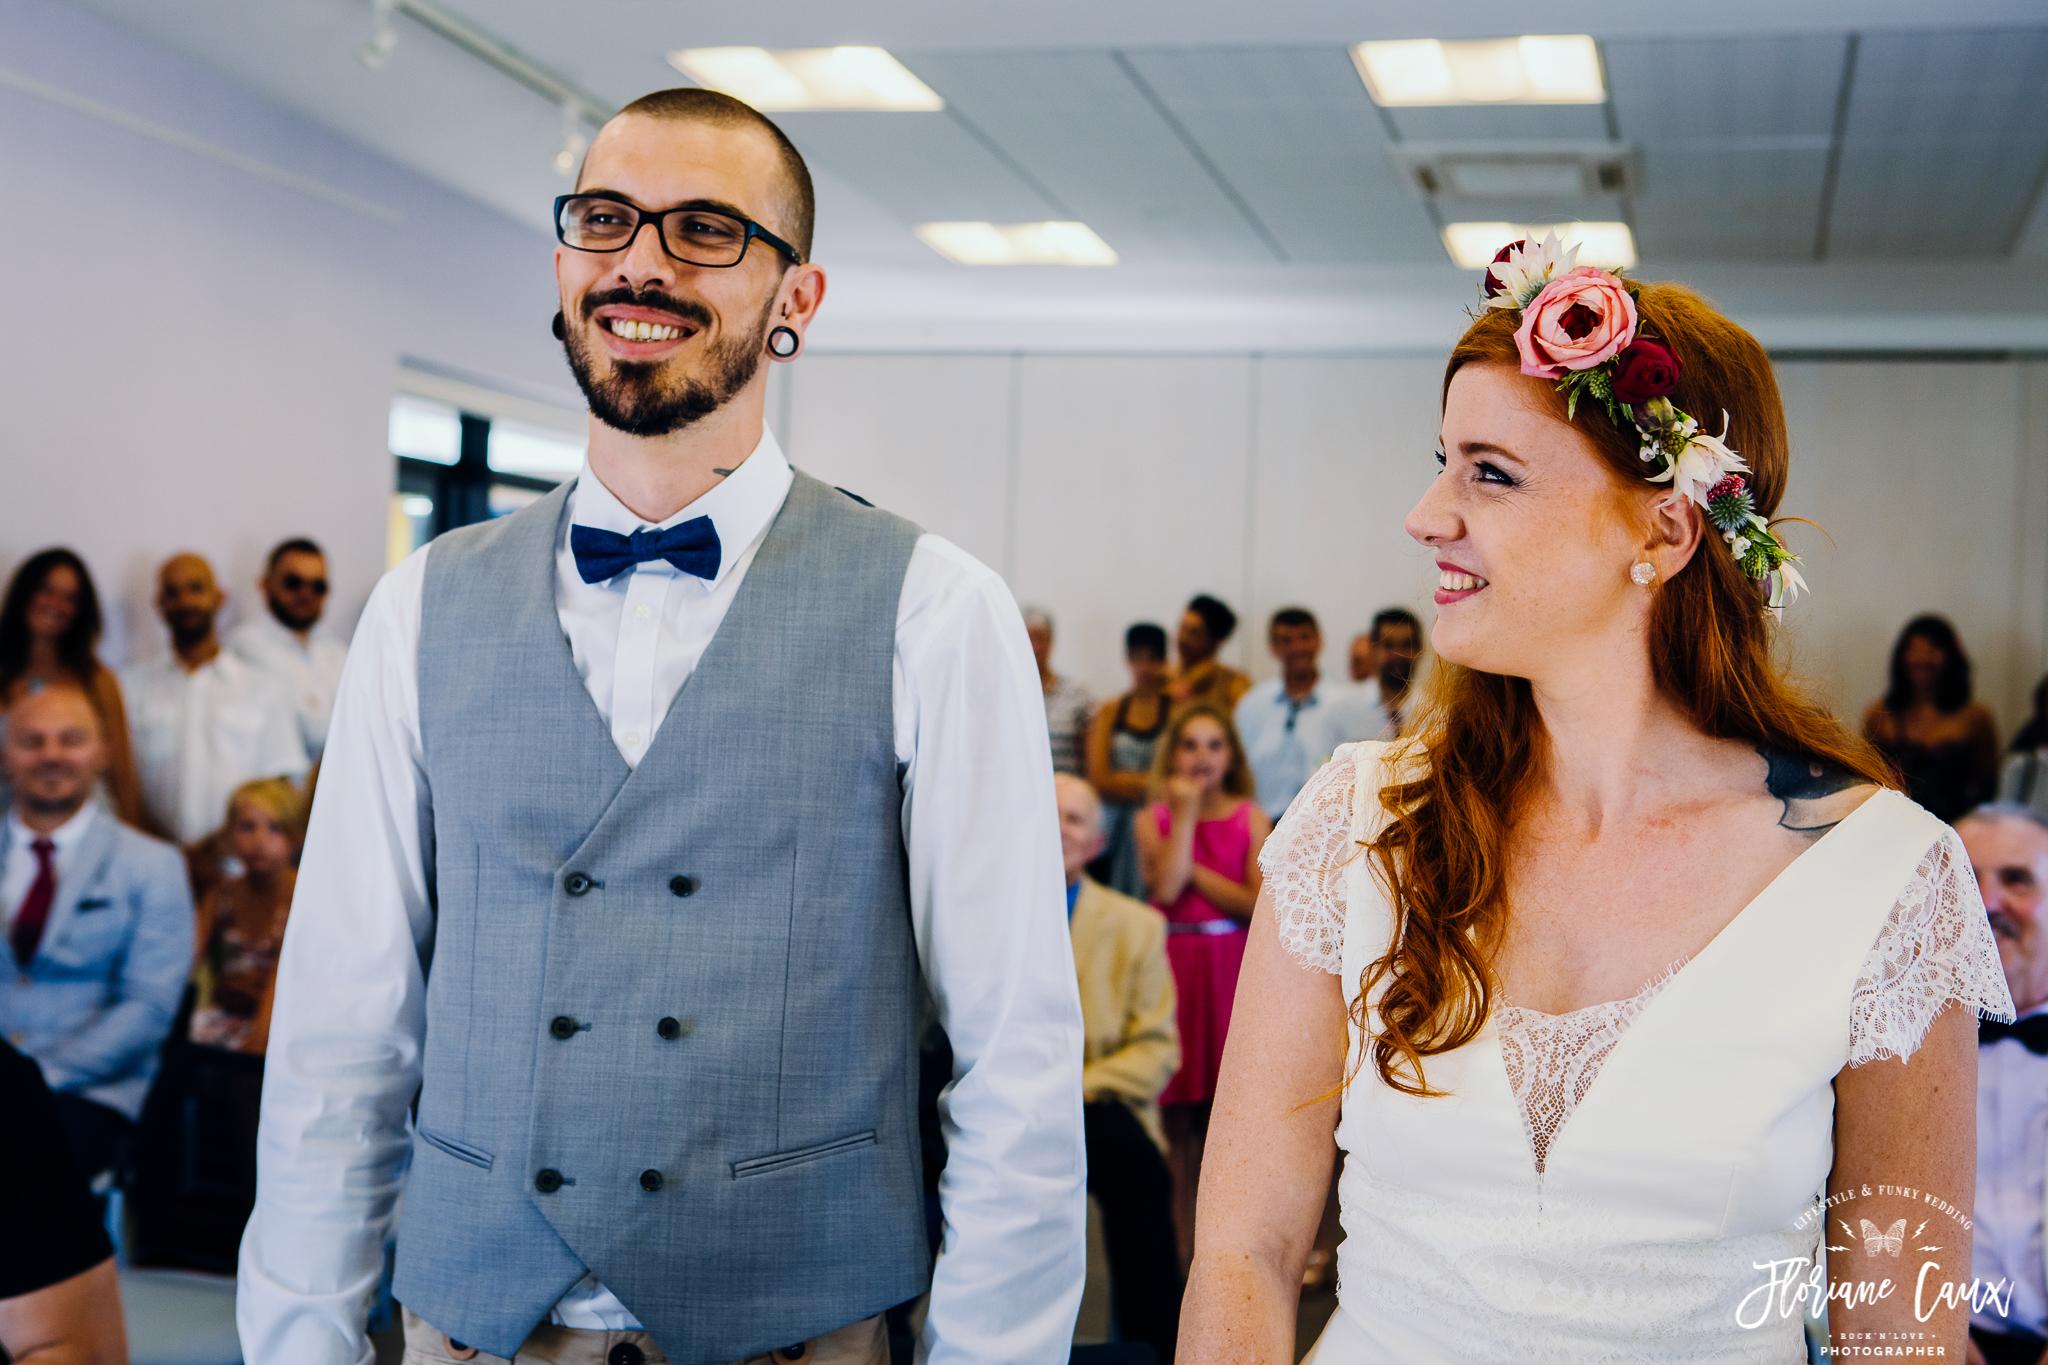 photographe-mariage-toulouse-rocknroll-maries-tatoues-floriane-caux-29